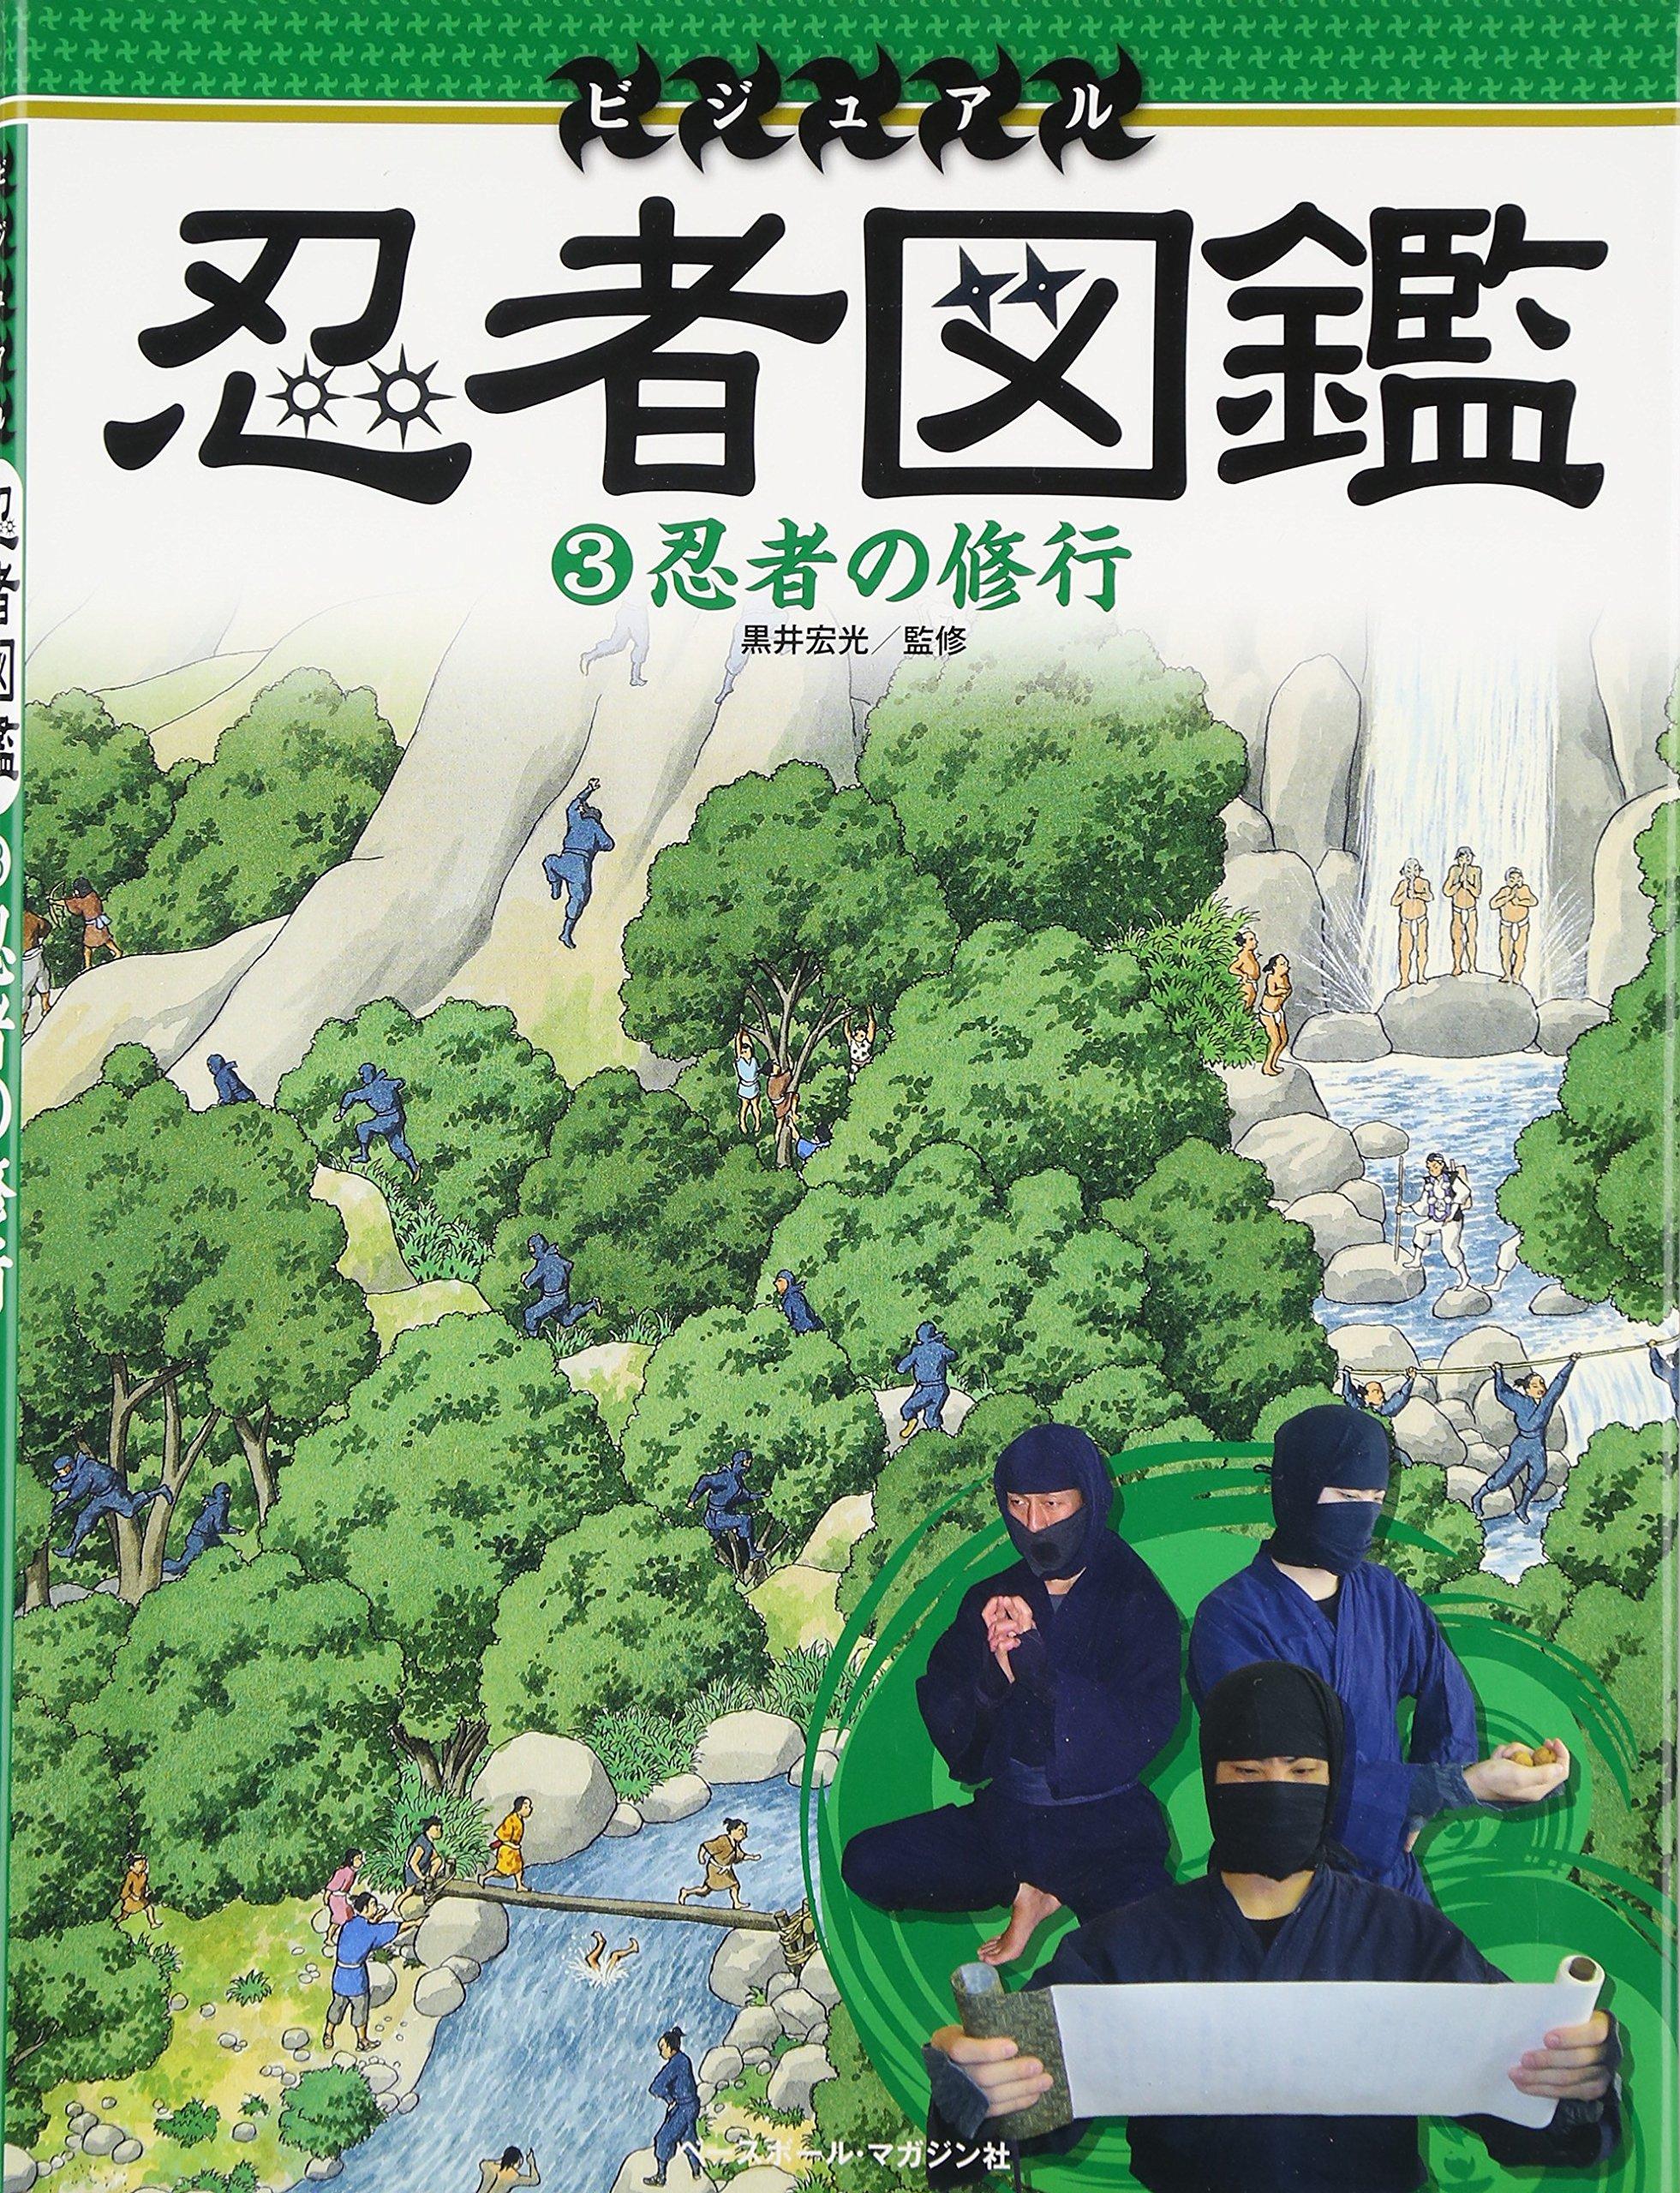 Ninja training visual picture book Ninja [JP Oversized] [JP ...